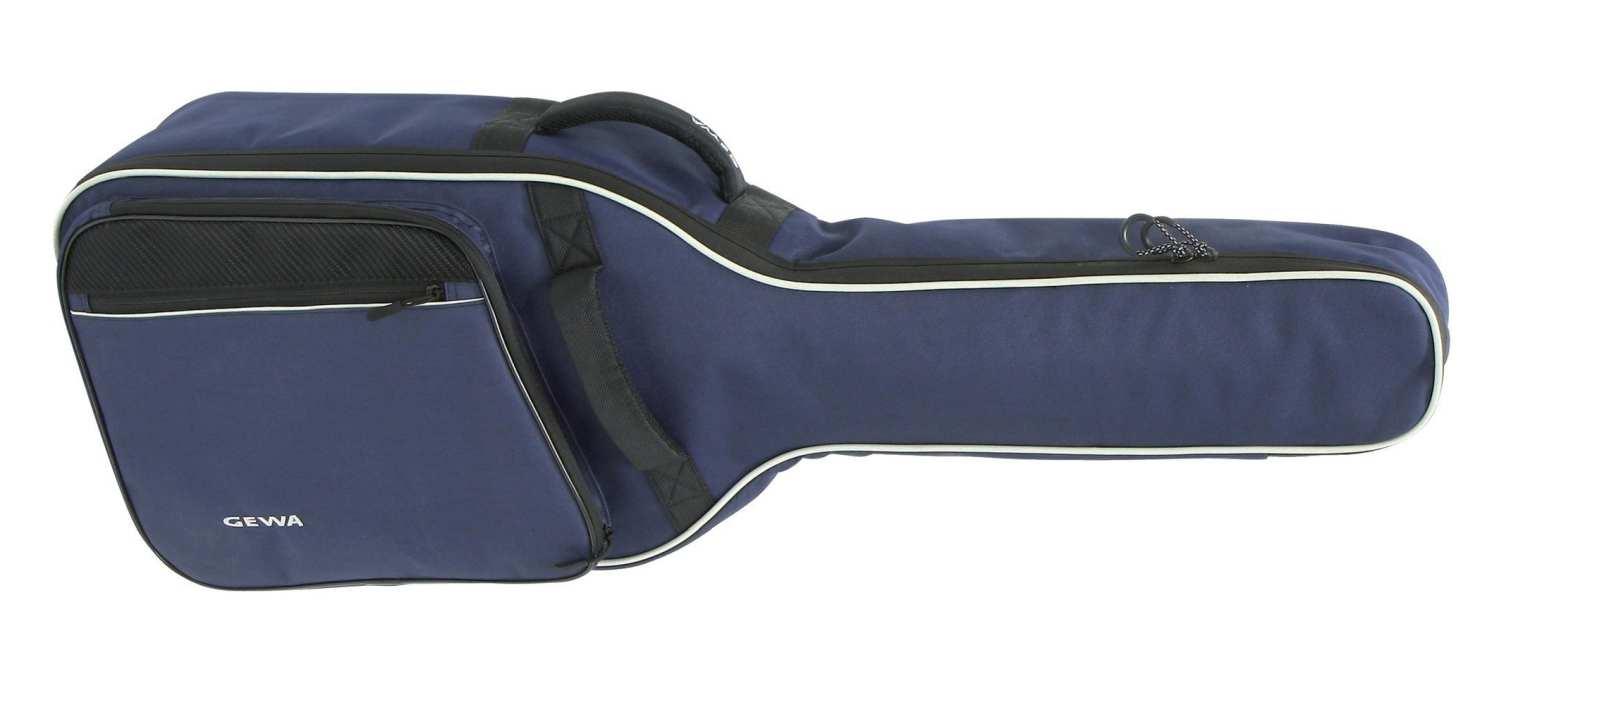 Gewa Gigbag Konzertgitarre 3/4 Eco blau